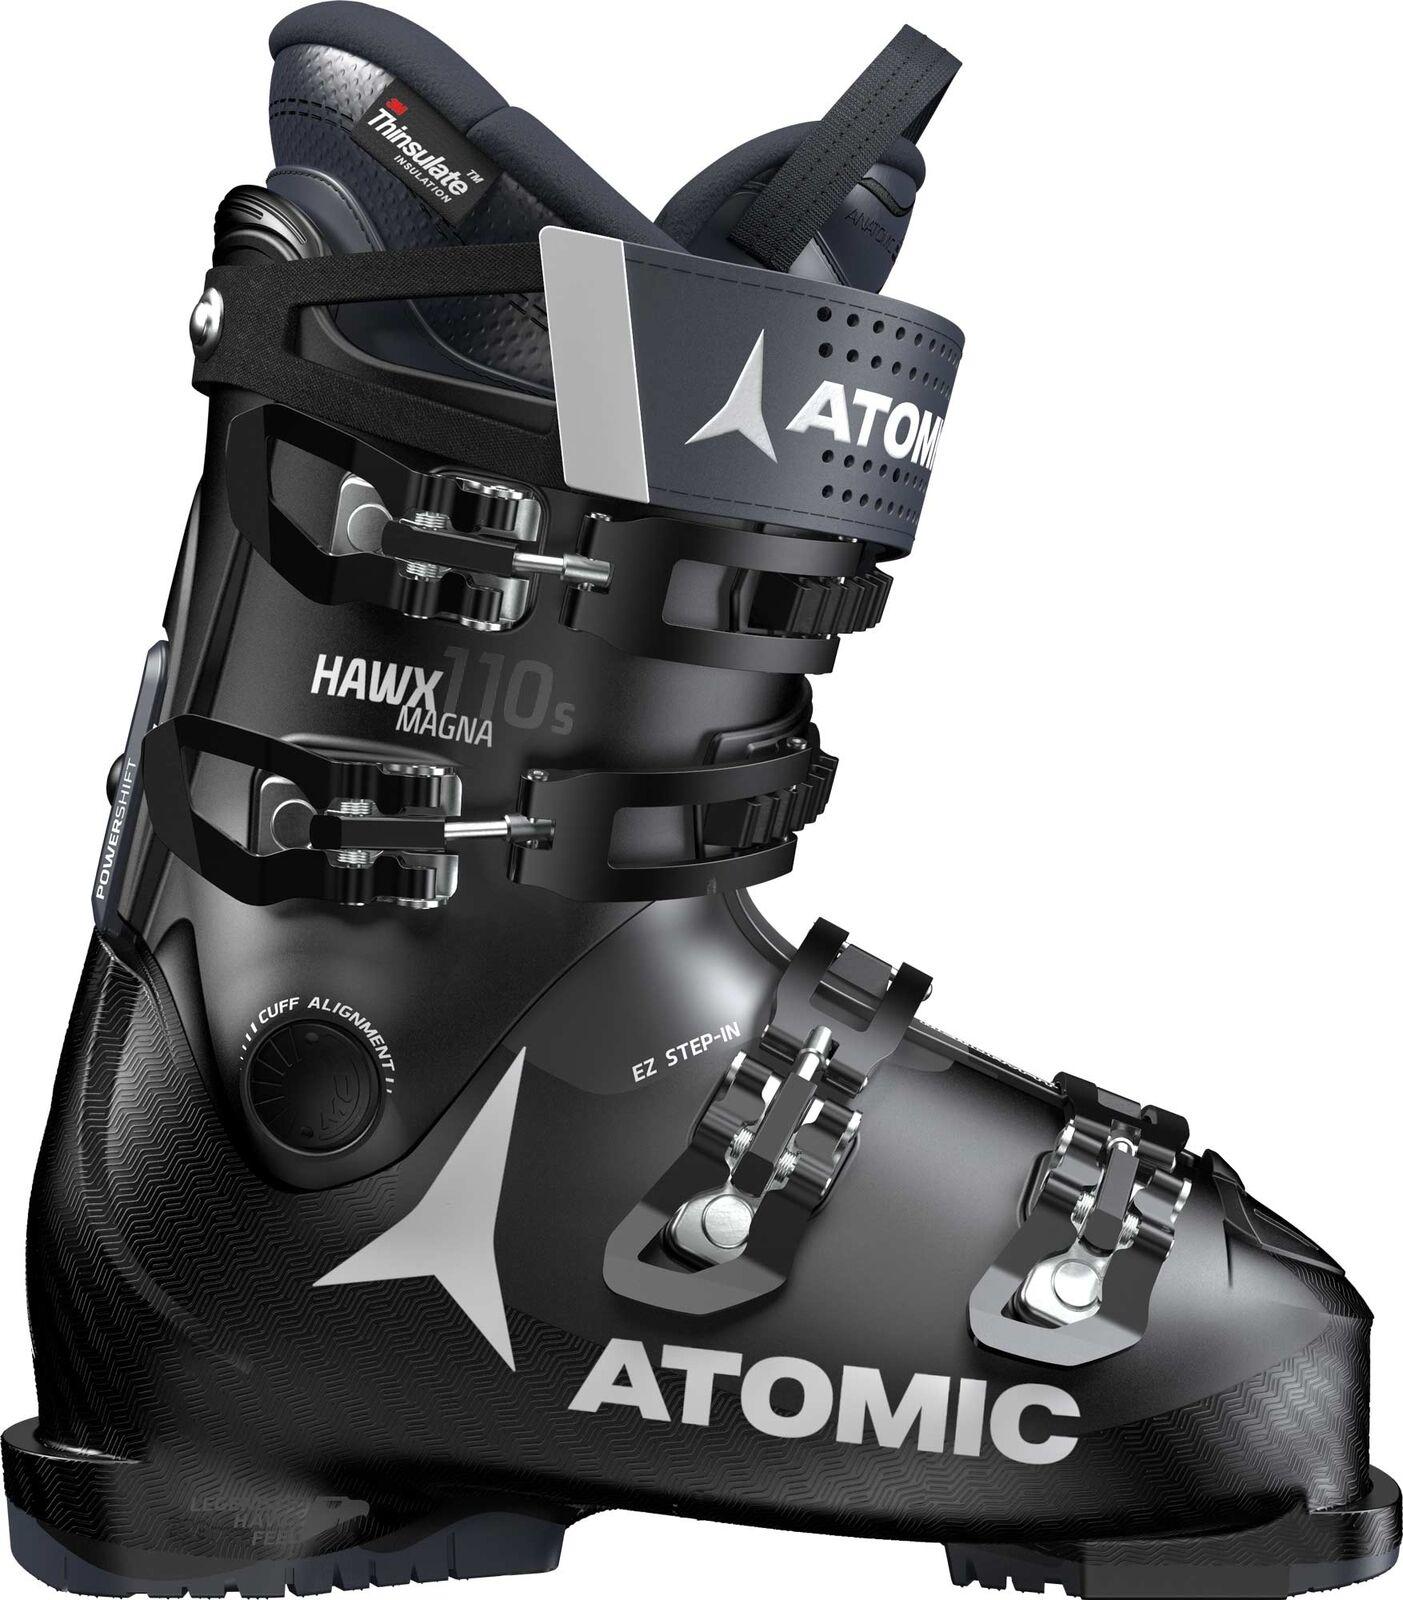 Atomic Hawx Magna 110 S (2019)